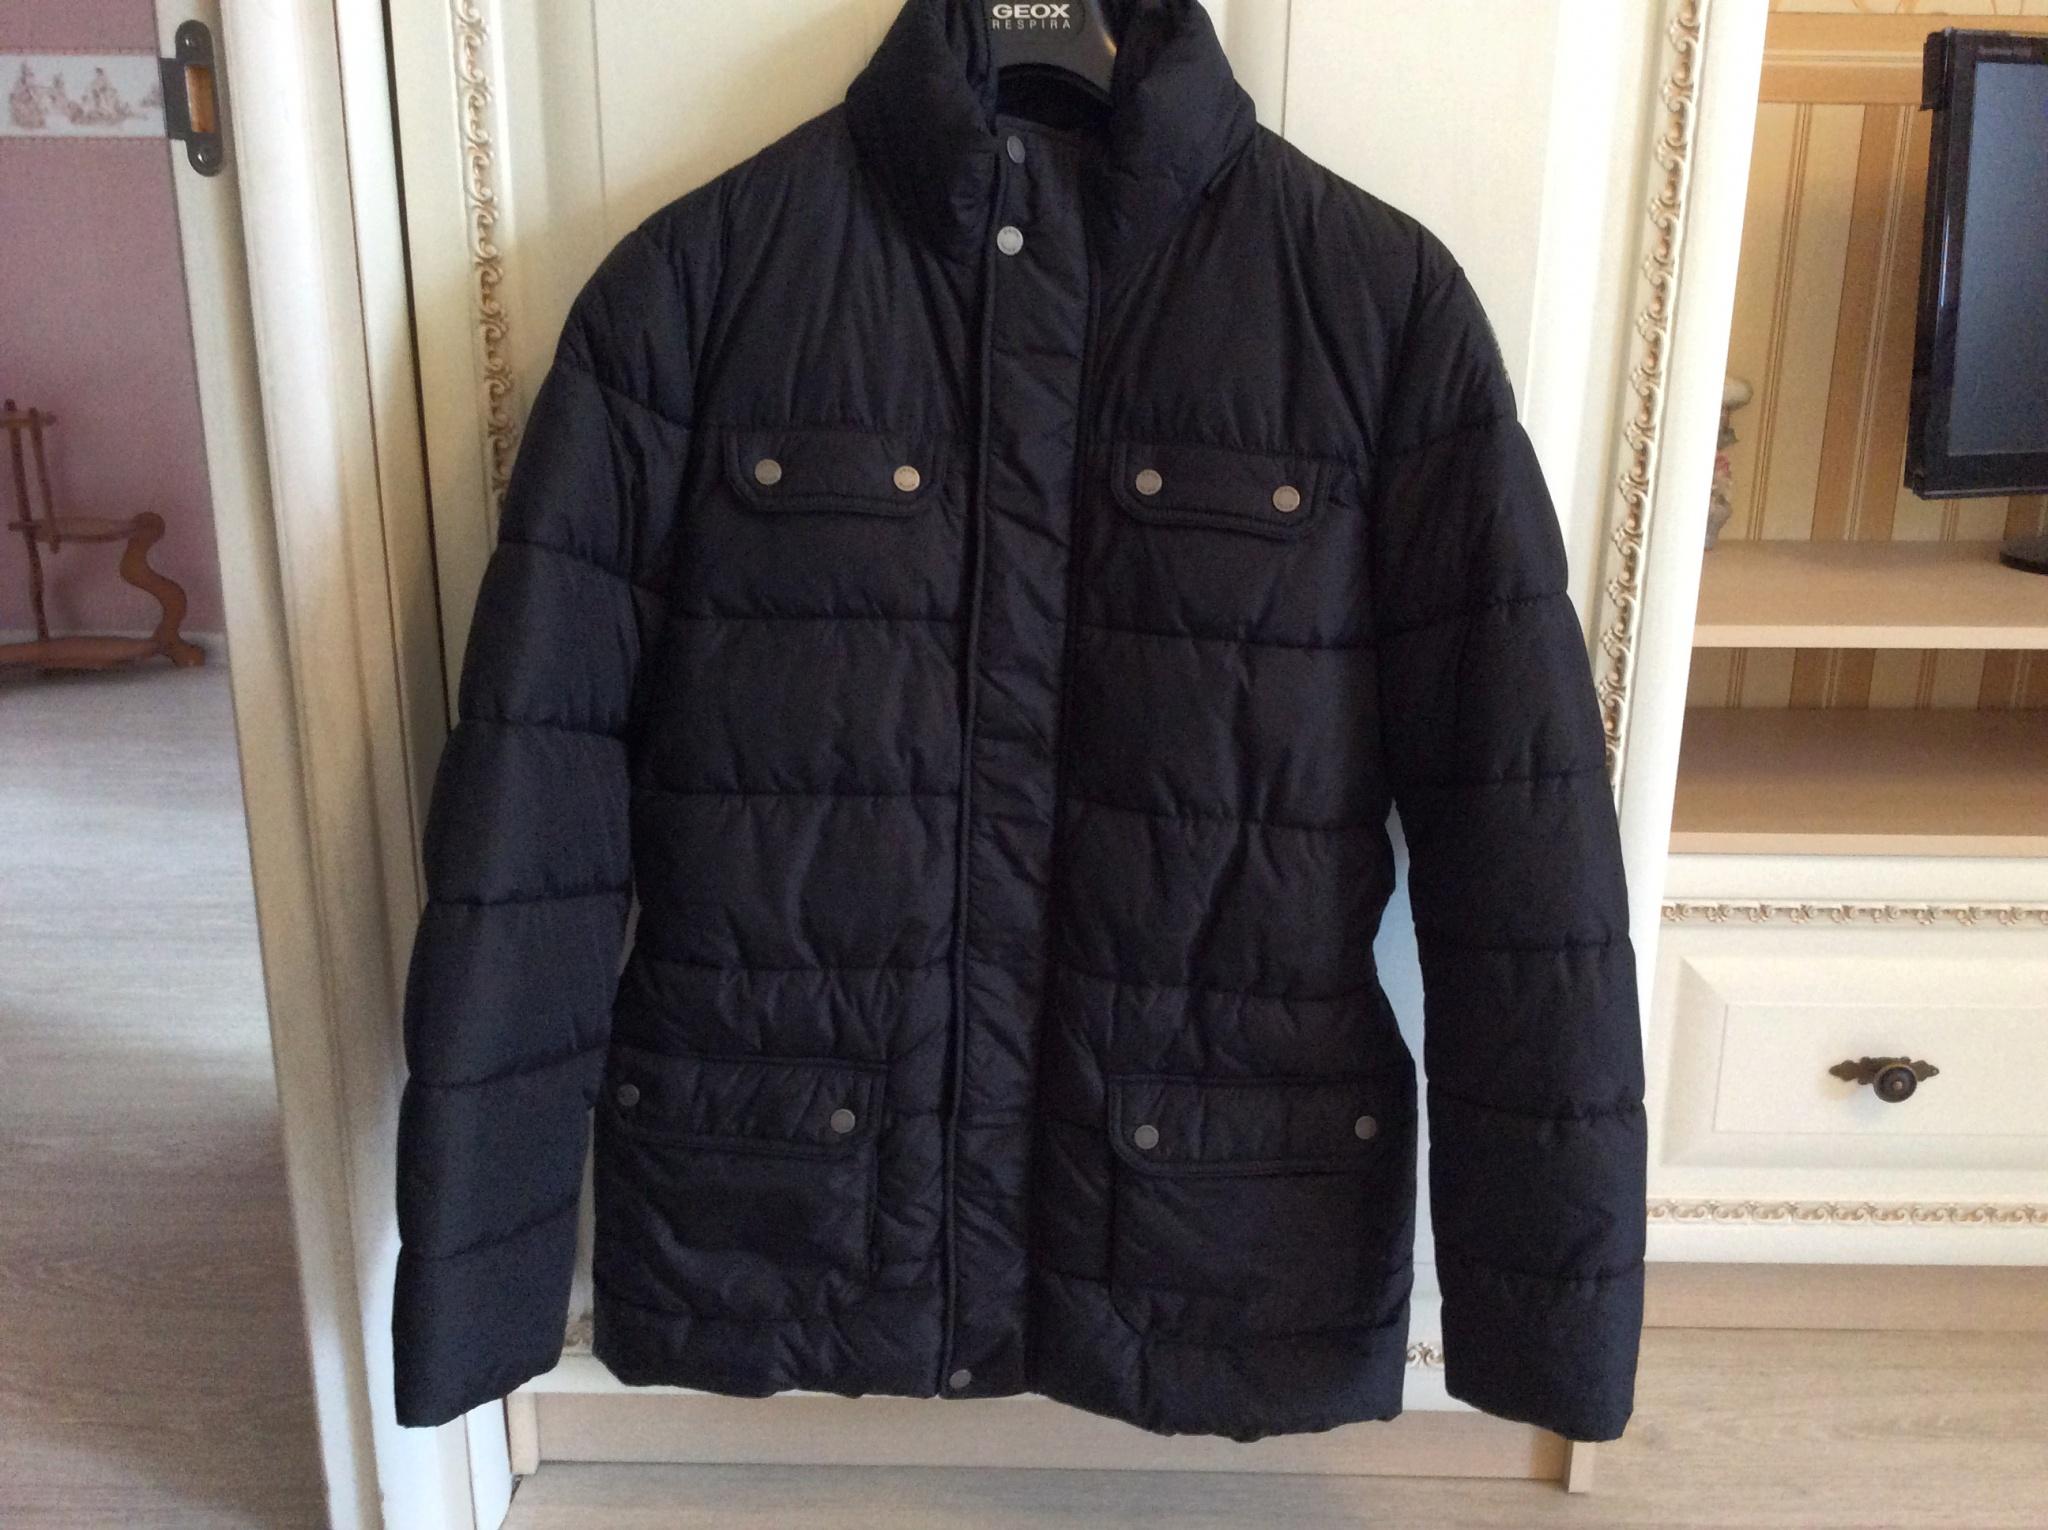 d4ab29f0ccf43 Обзор на Куртка GEOX MAN JACKET M5428A мужская, цвет черный, рус. размер 50